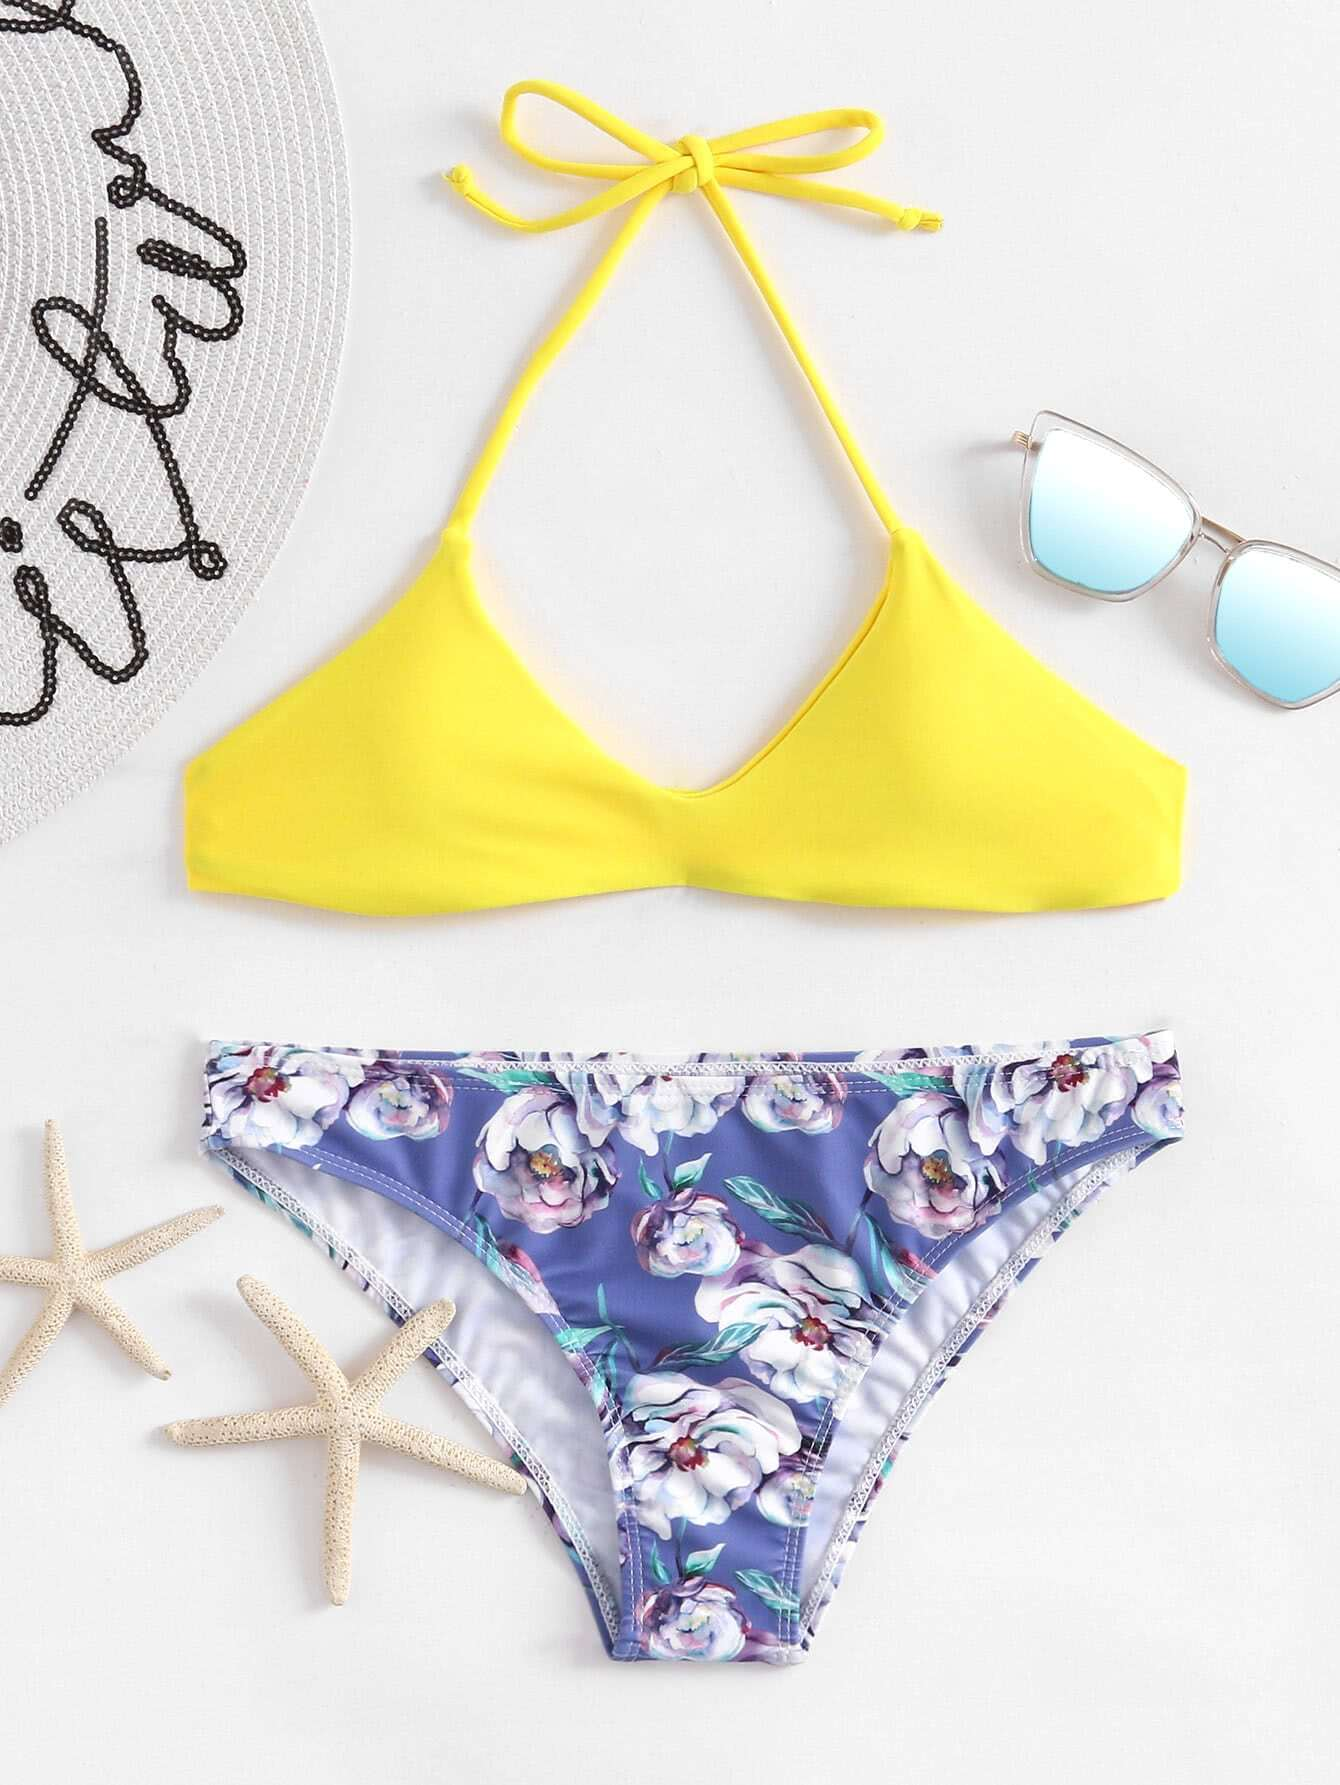 Calico Print Halter Bikini Set swimwear170809302